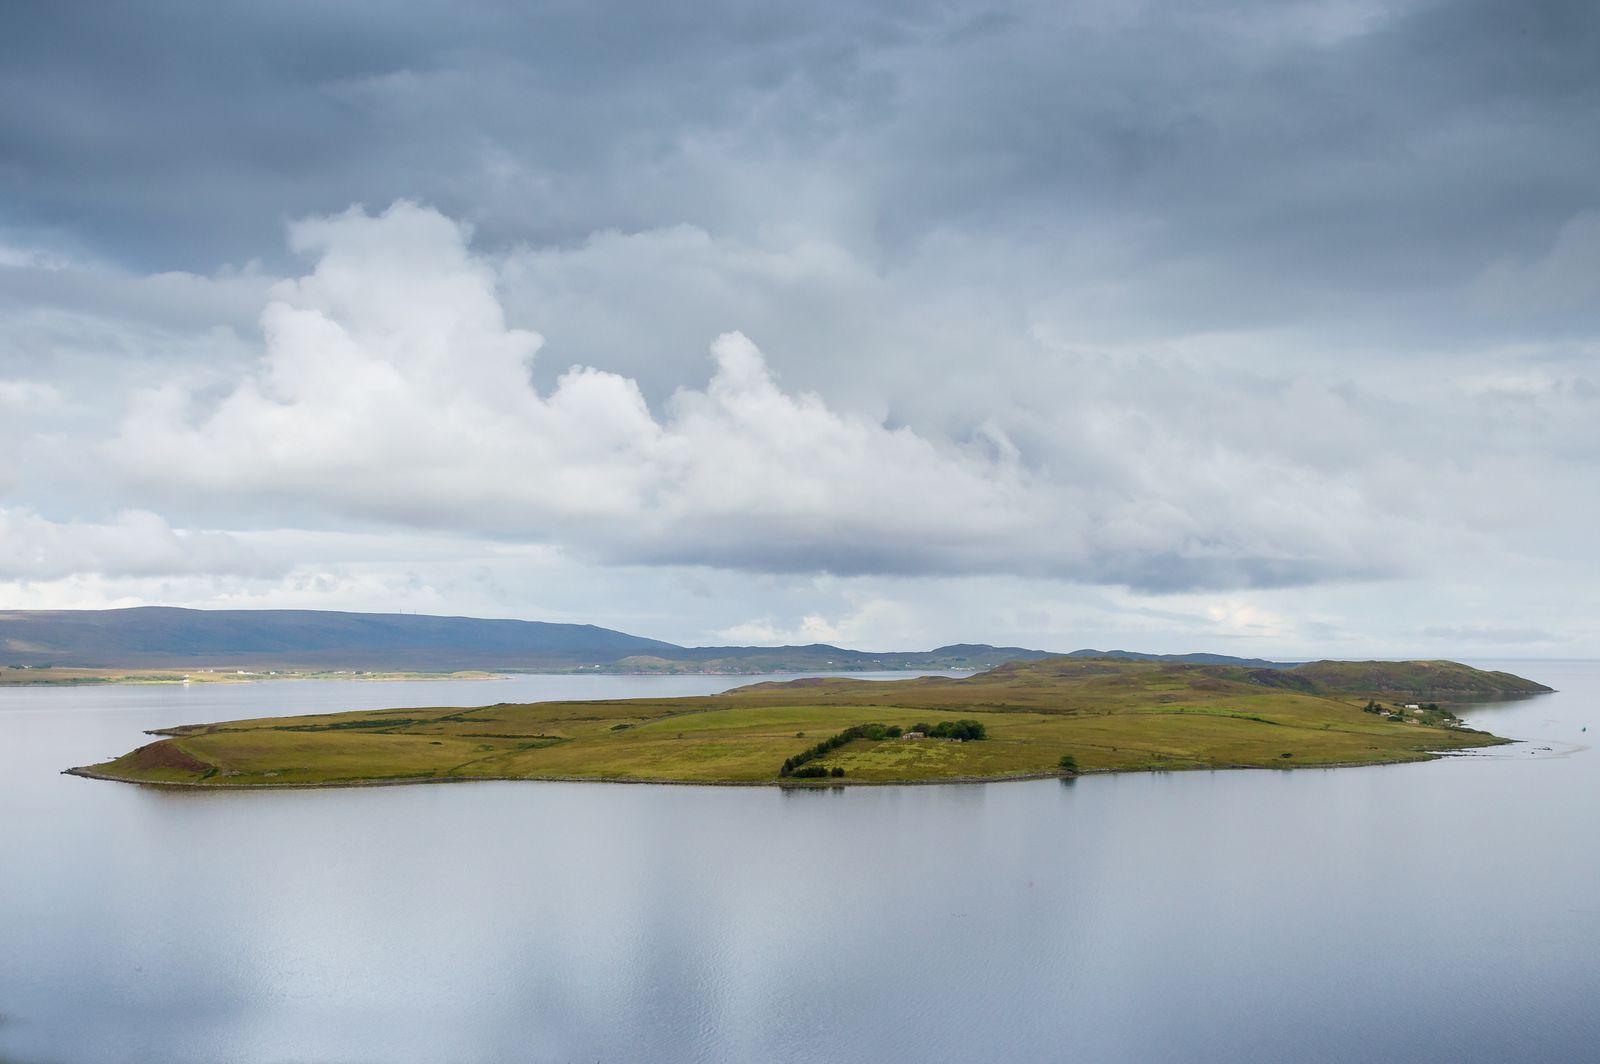 Gruinard island, the Anthrax island, Scotland